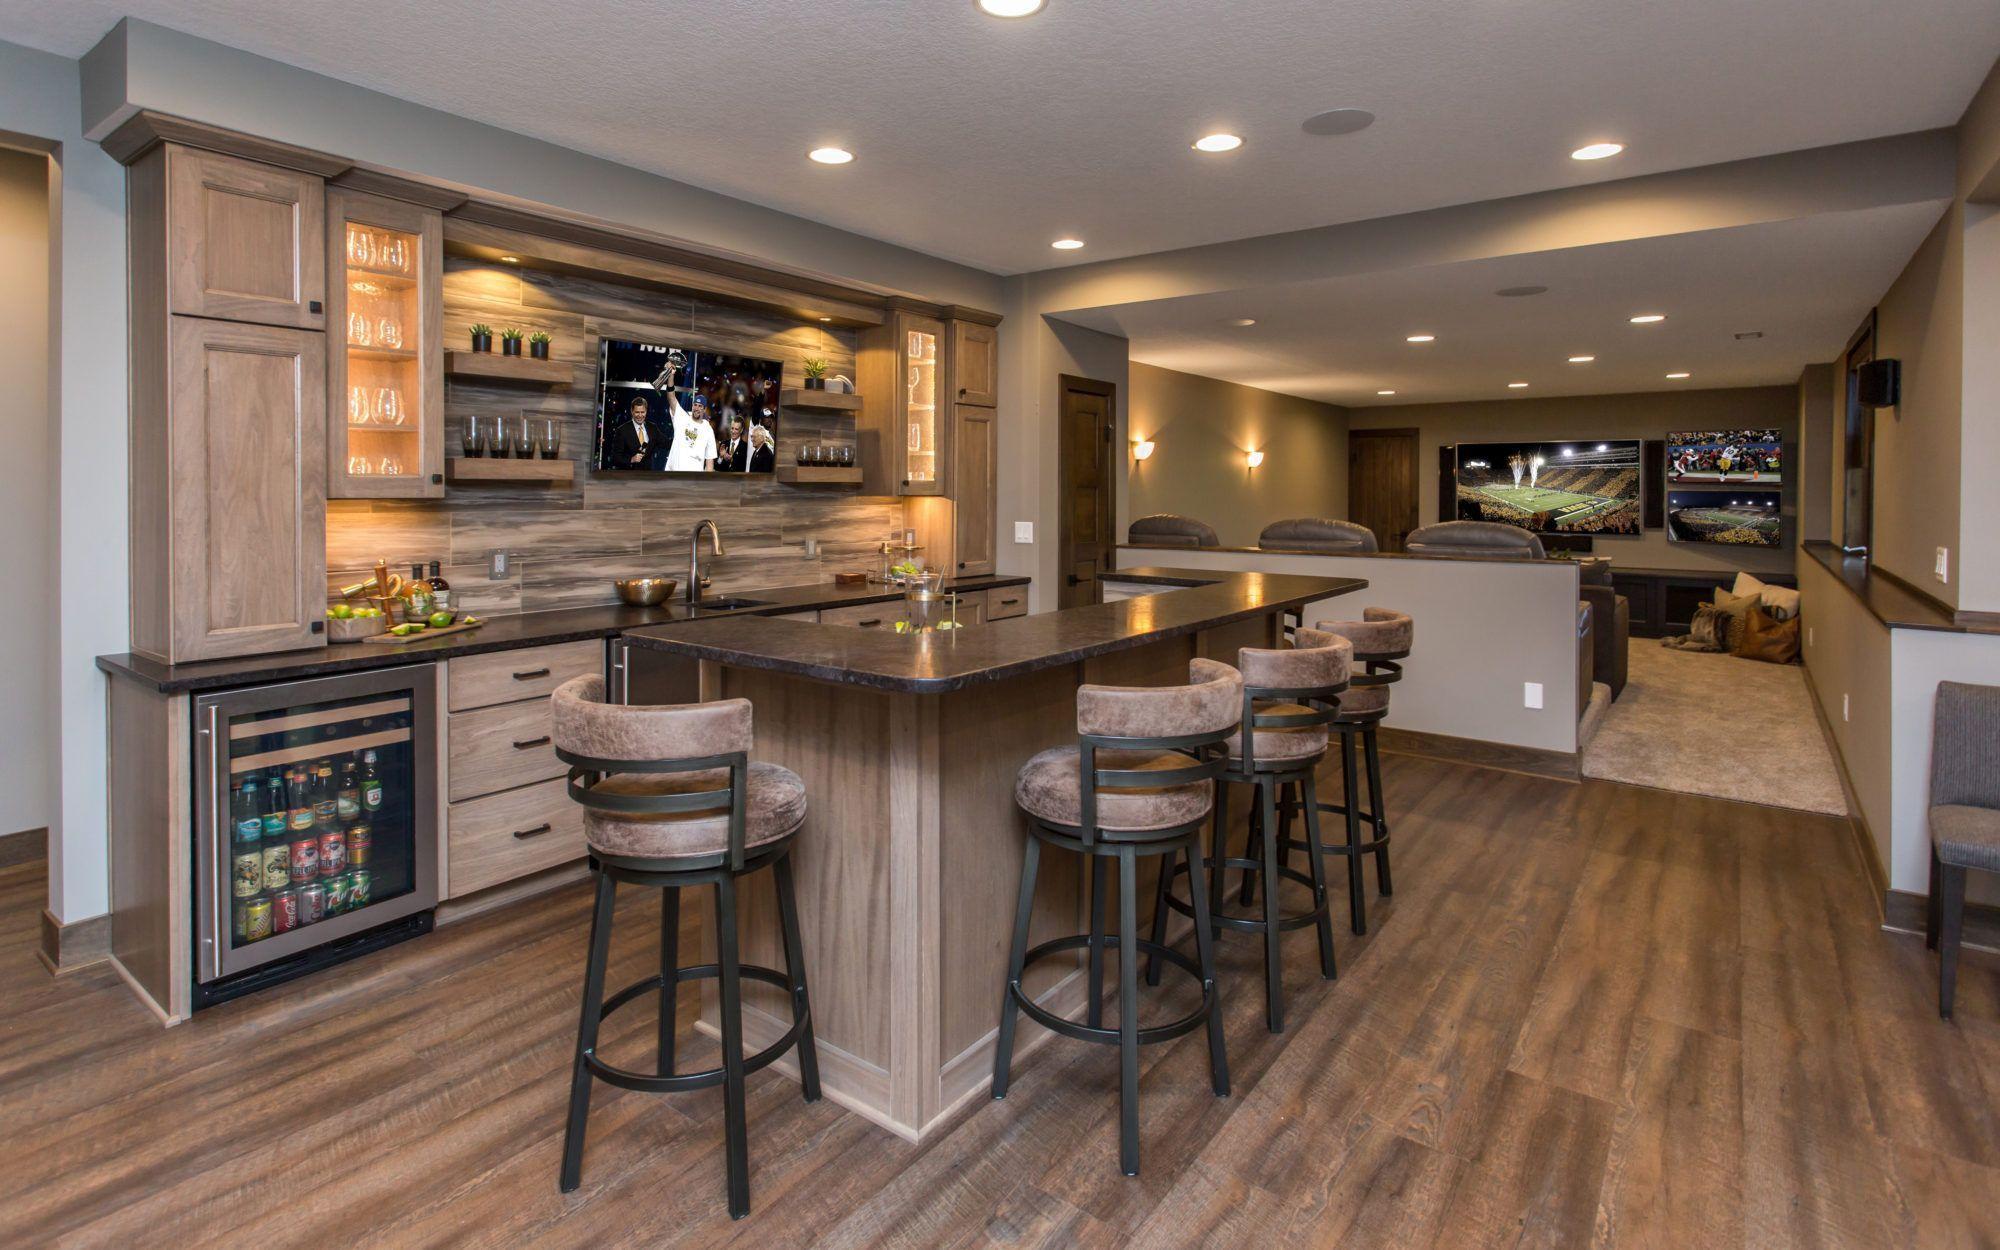 Basement Remodeling Gallery – Red House Remodeling  Diseños de